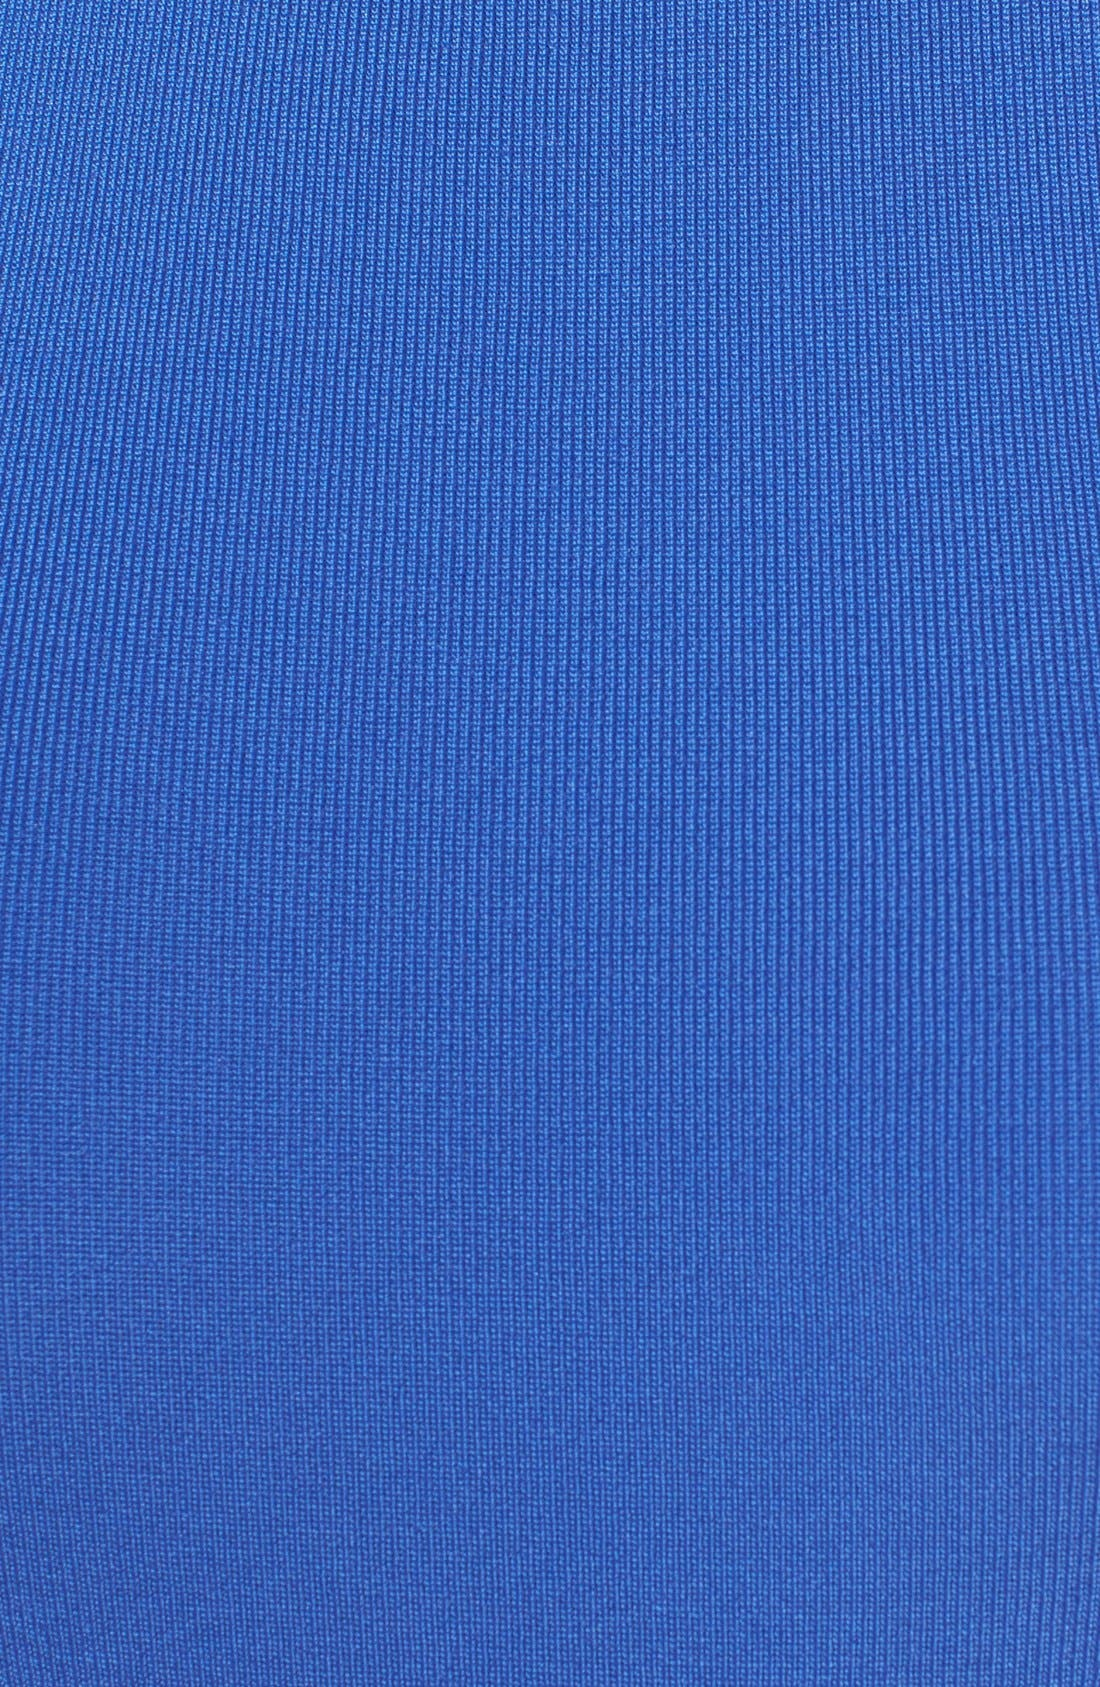 Sleeveless Mock Neck Knit Dress,                             Alternate thumbnail 32, color,